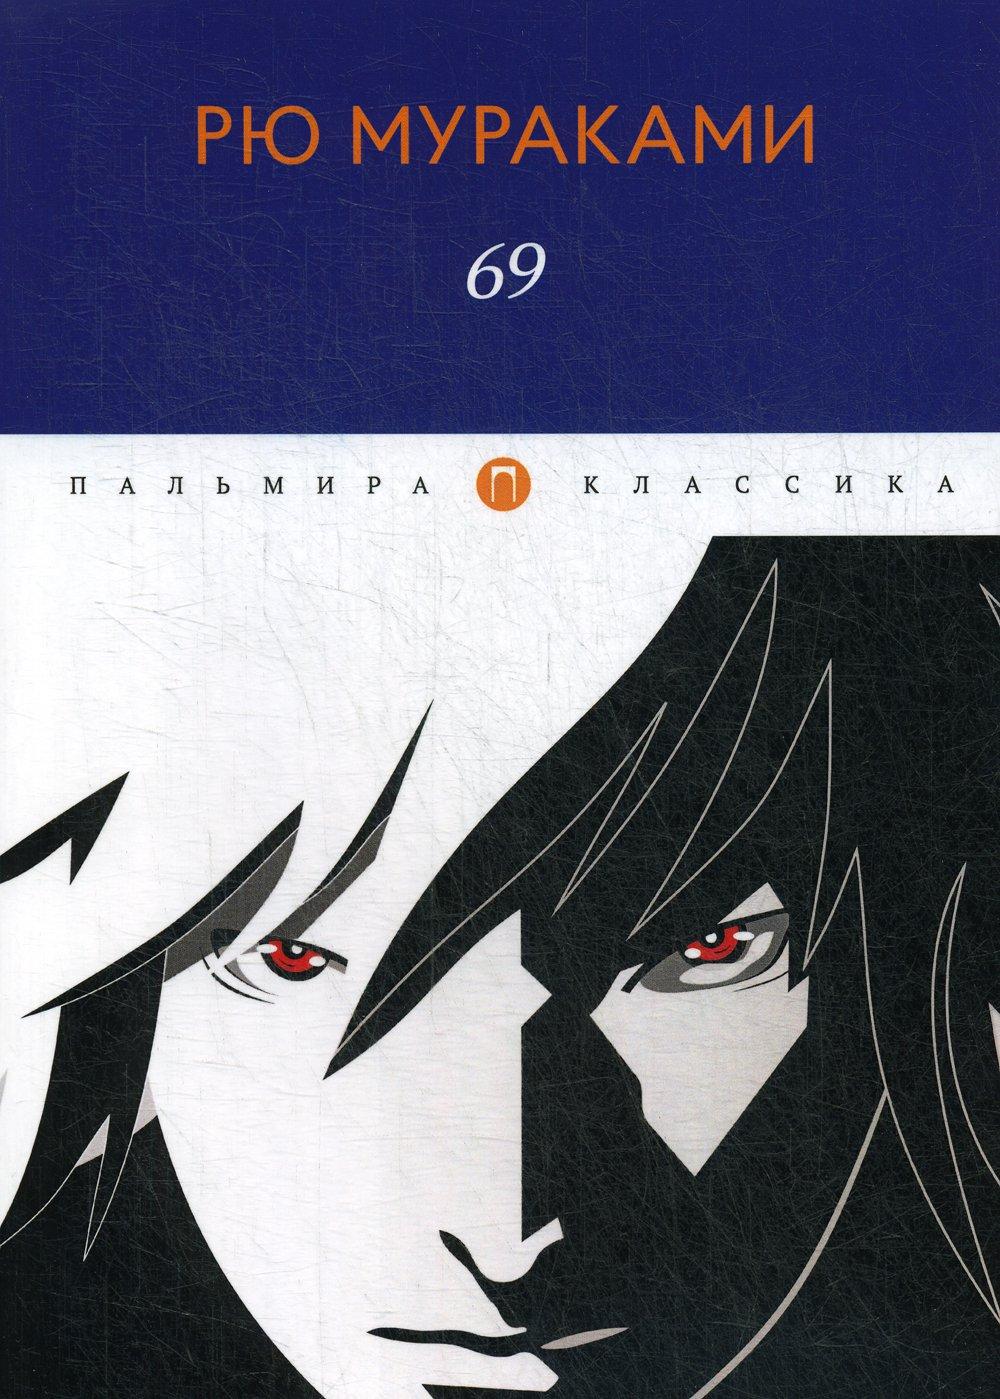 Мураками Рю 69: роман